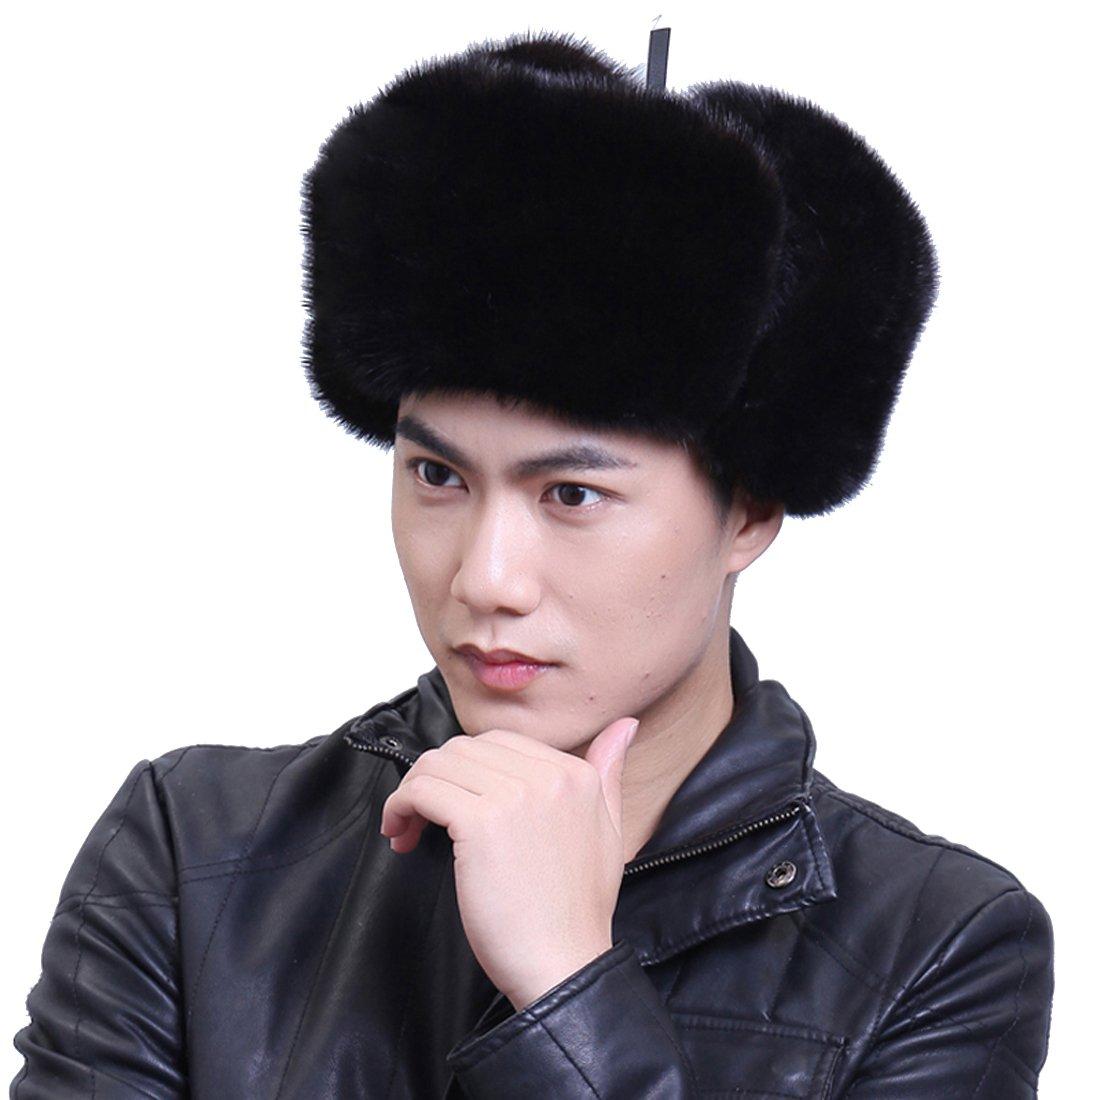 URSFUR Men's Mink Fur & Leather Russian Ushanka Hats (One Size, Black) by URSFUR